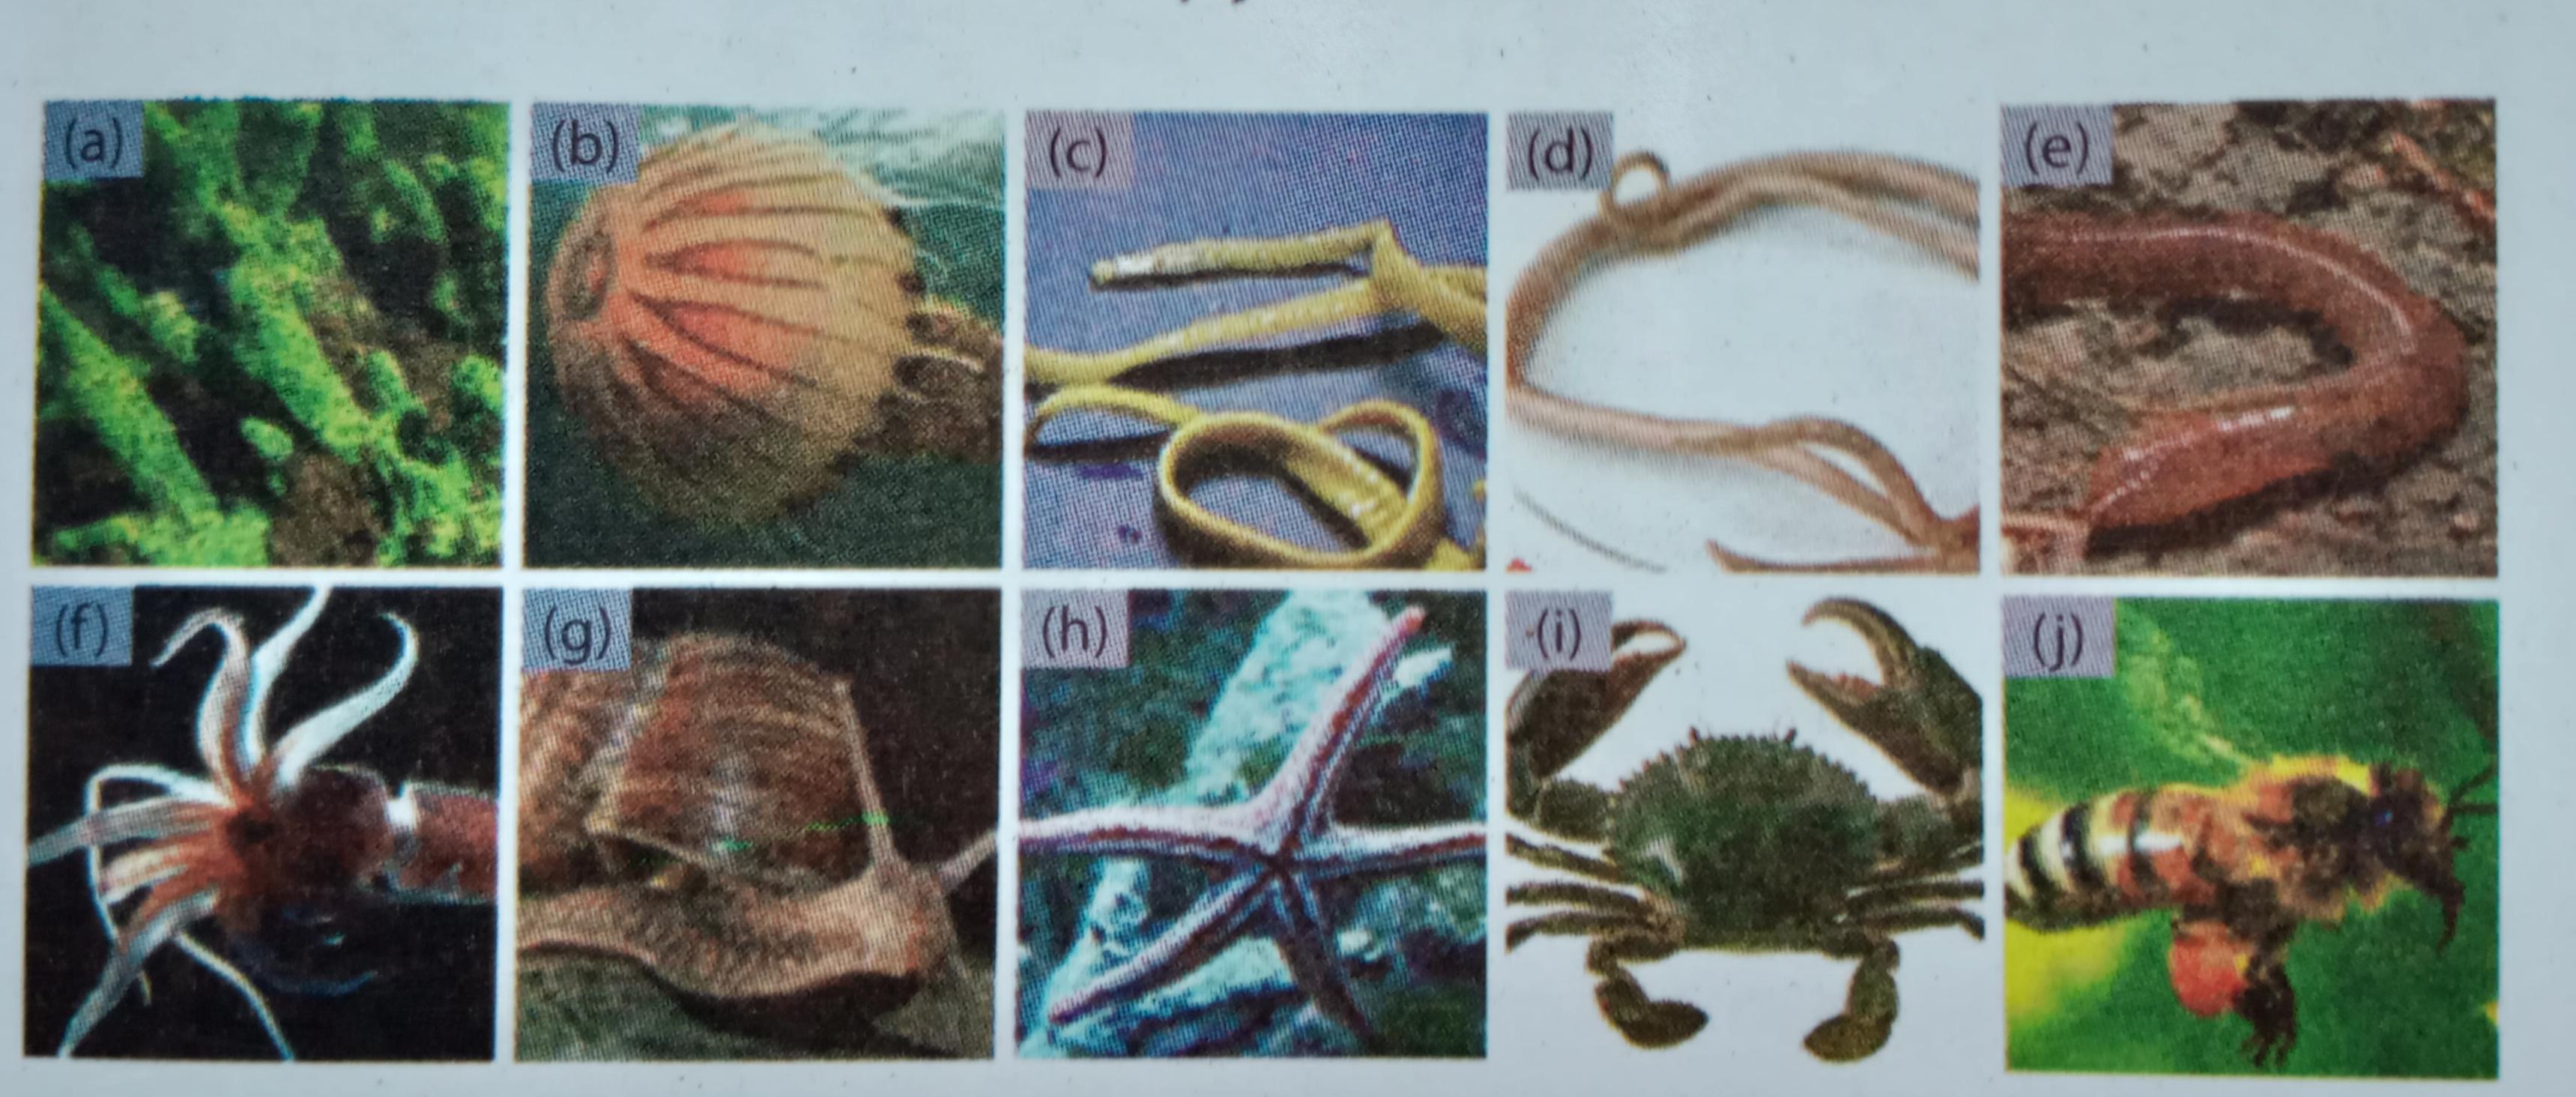 hewan yang termasuk nemathelminthes